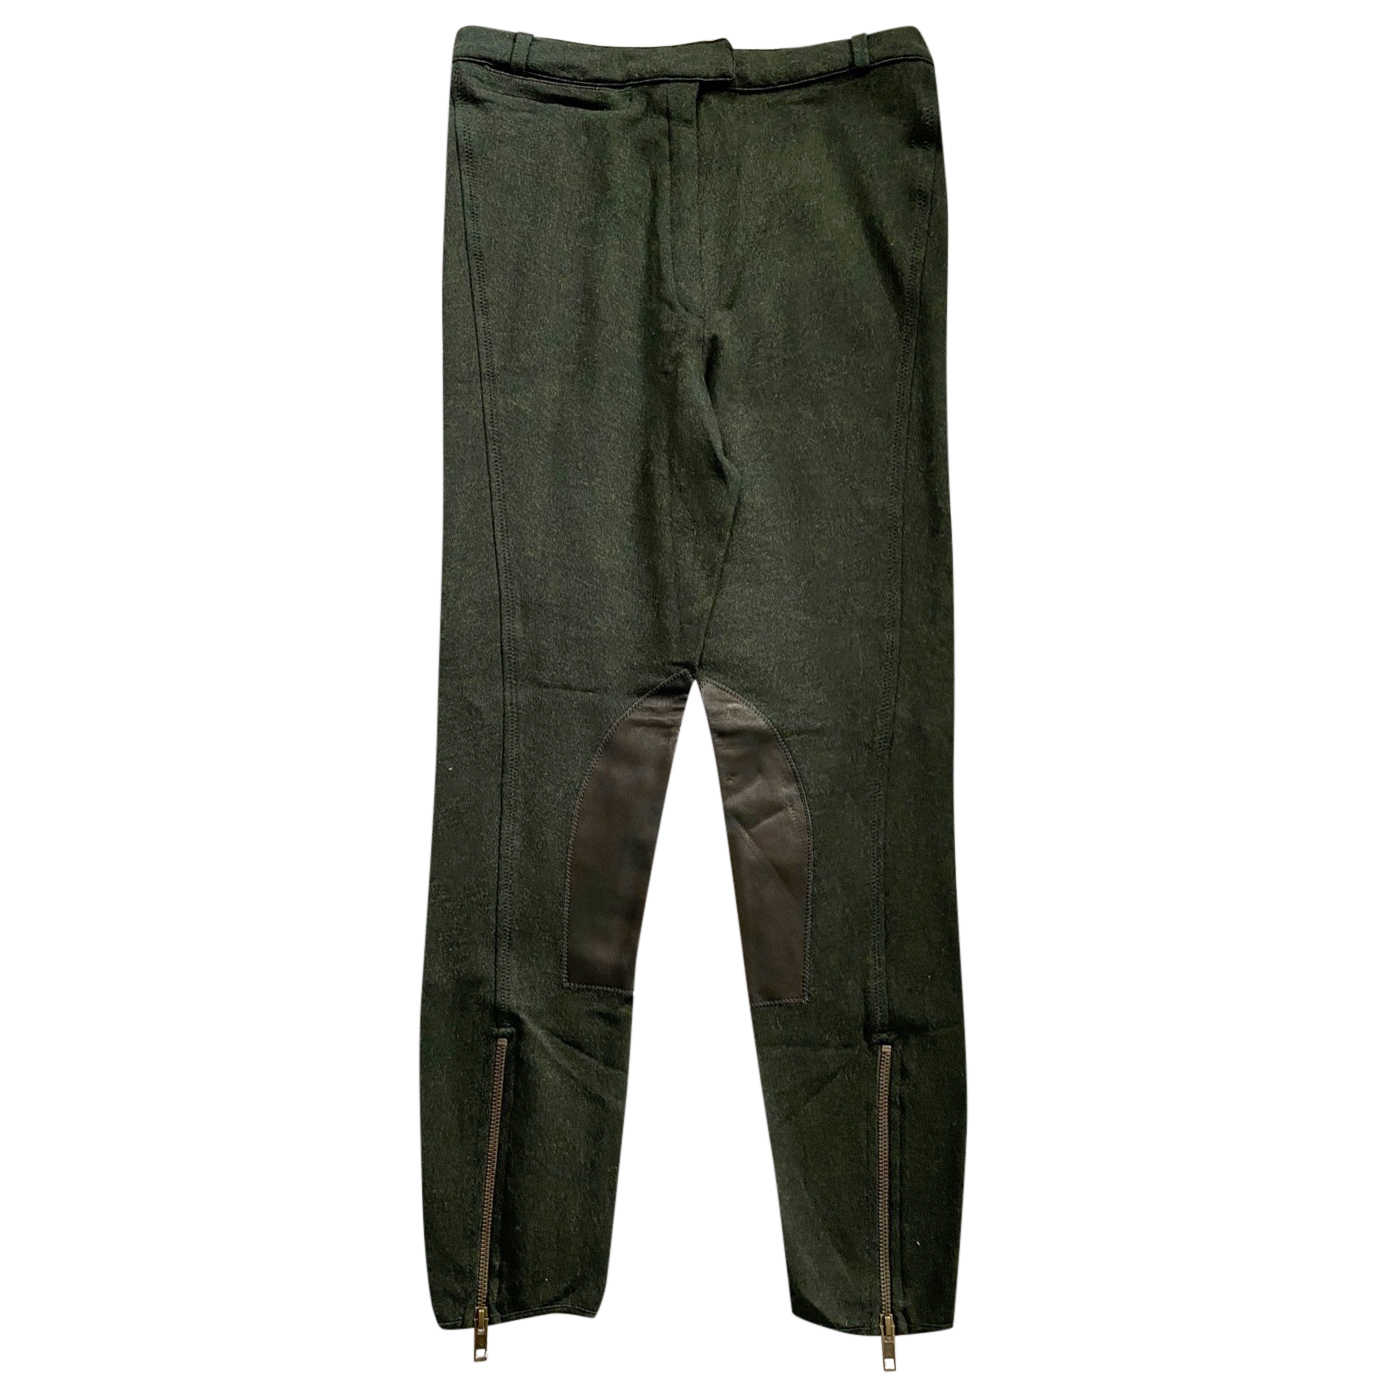 McQ Khaki Leather trimmed Leggings